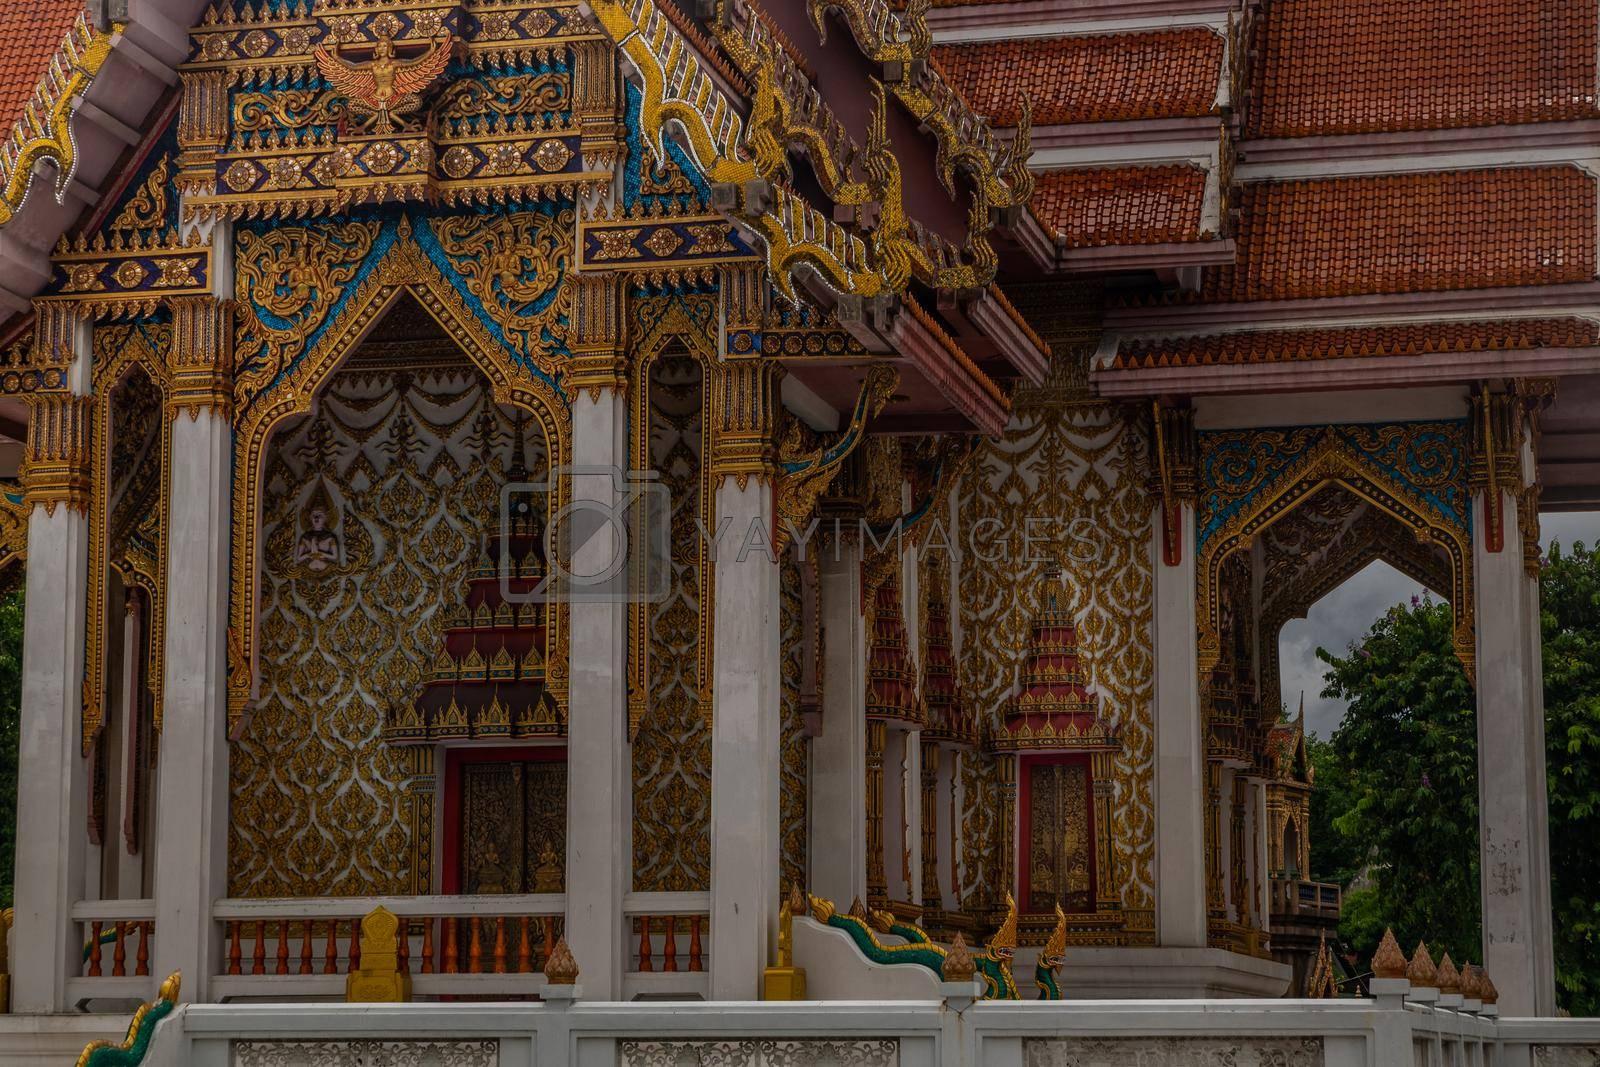 Bangkok, thailand - jun 29, 2019 : Beautiful architecture of chong Nonsi buddhist temple (Wat Chongnonsi) in rama3 road.